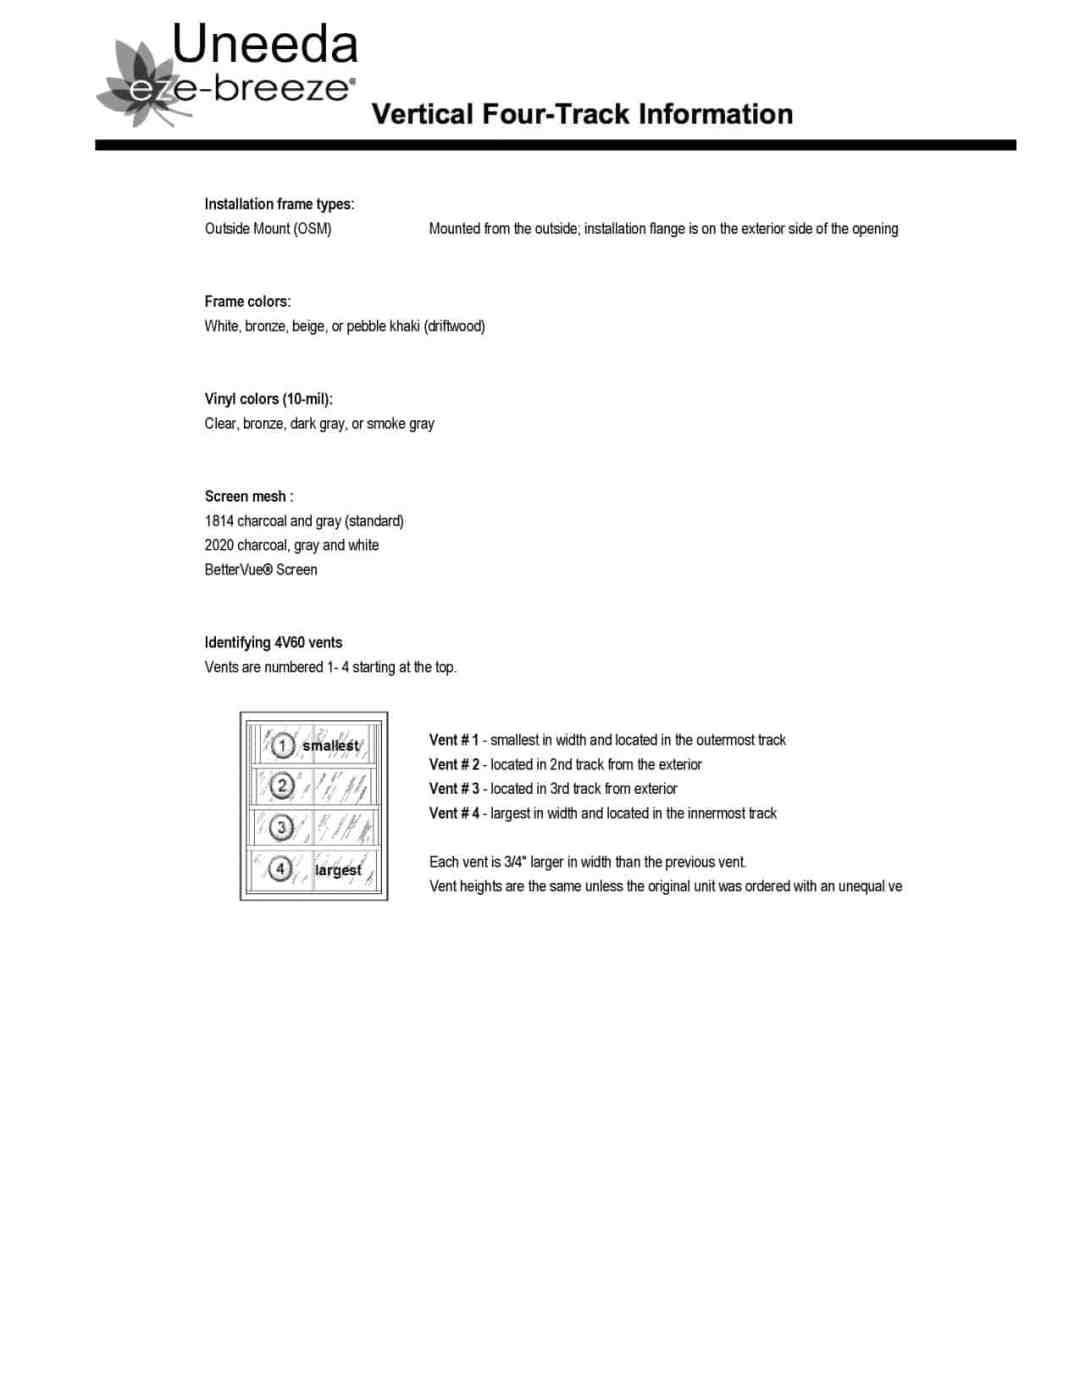 Vertical-4-track-info